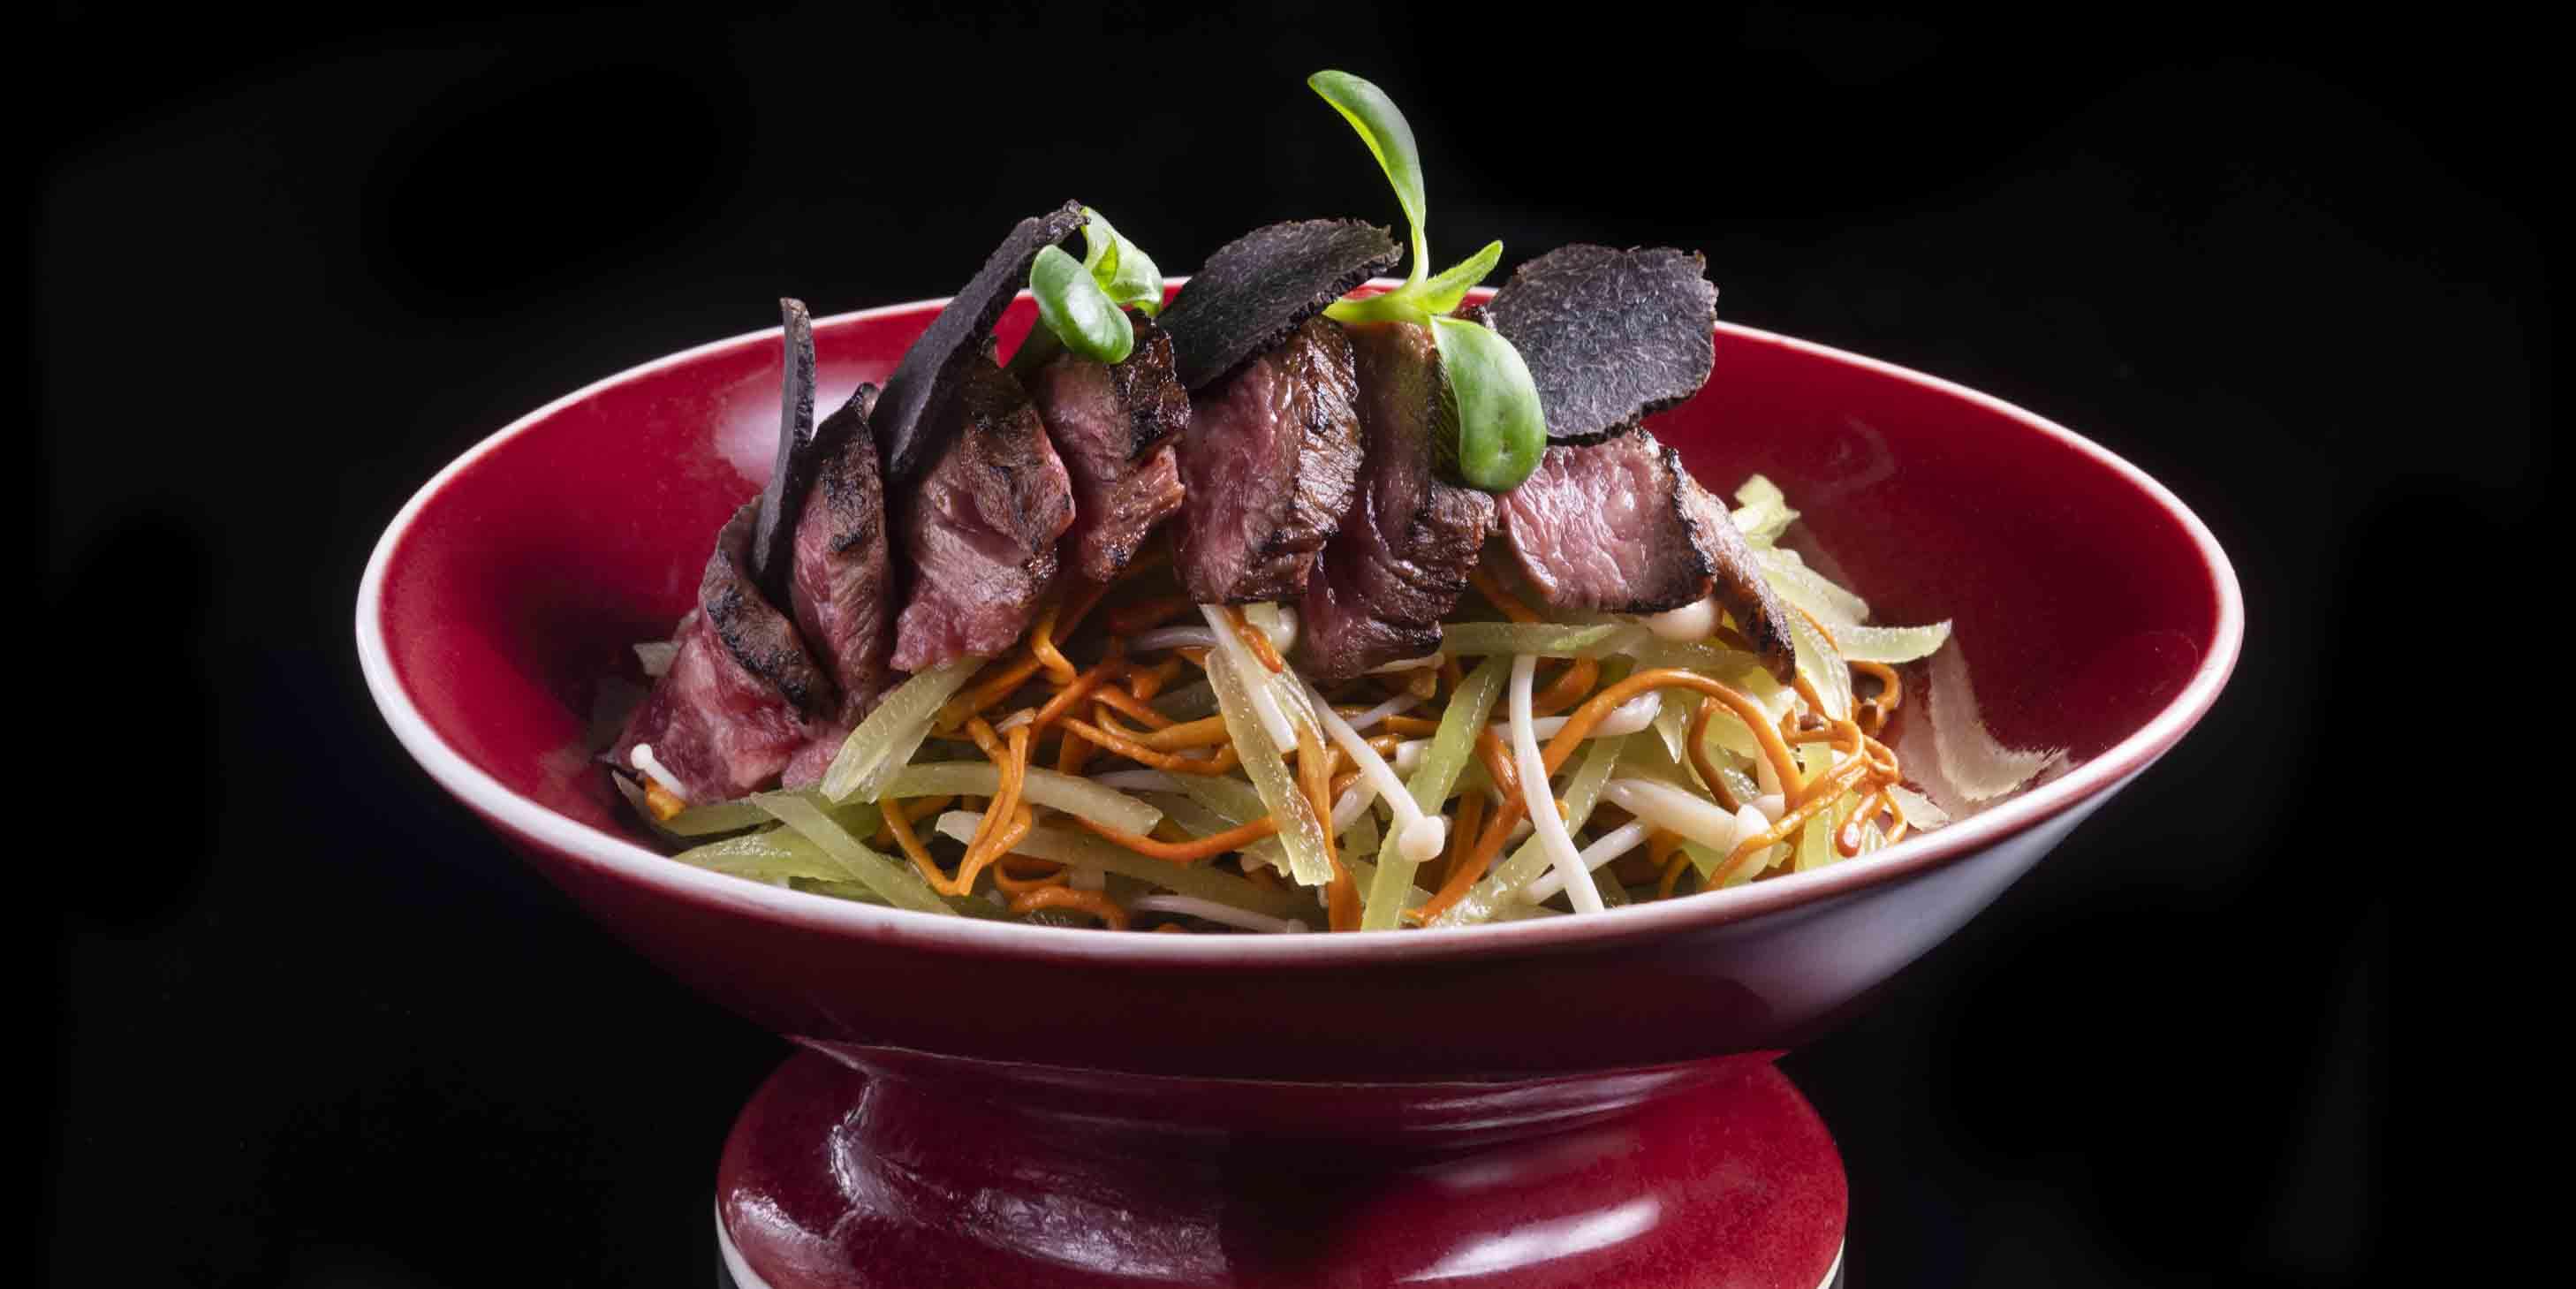 Beef Tongue Salad of Hakkasan located on the Bund, Huangpu